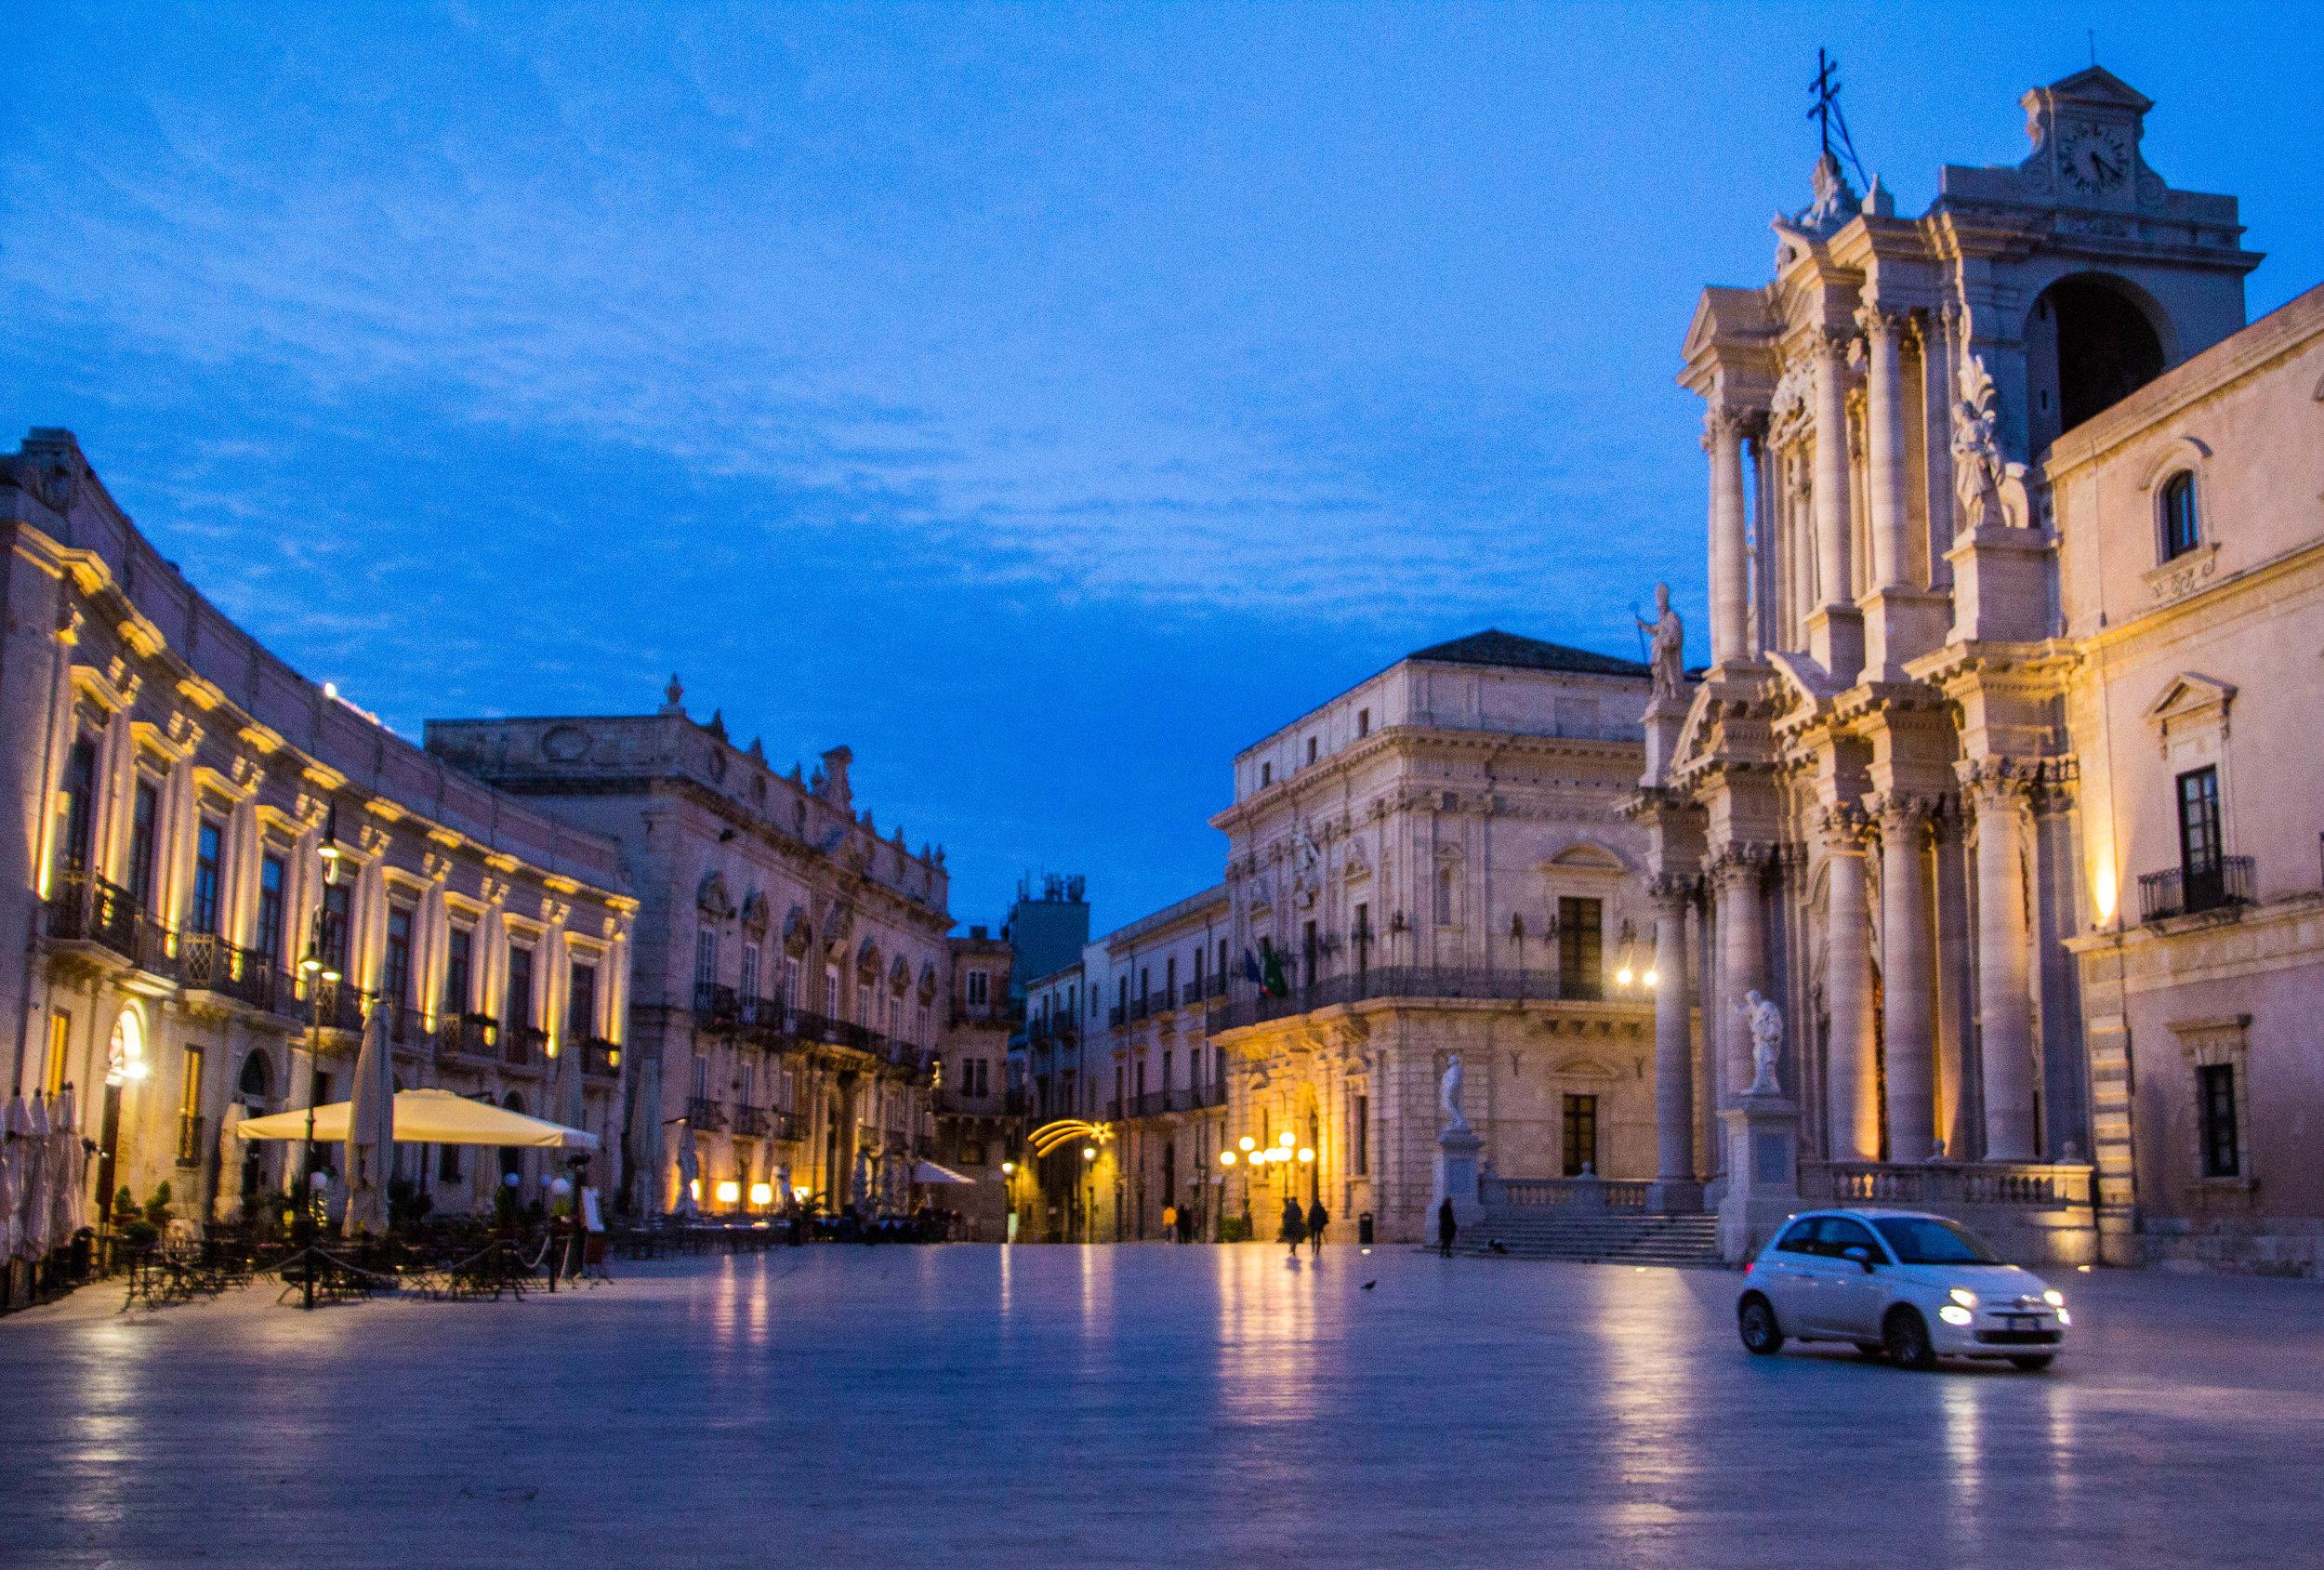 piazza-duomo-sunset-ortygia-syracuse-sicily-30.jpg